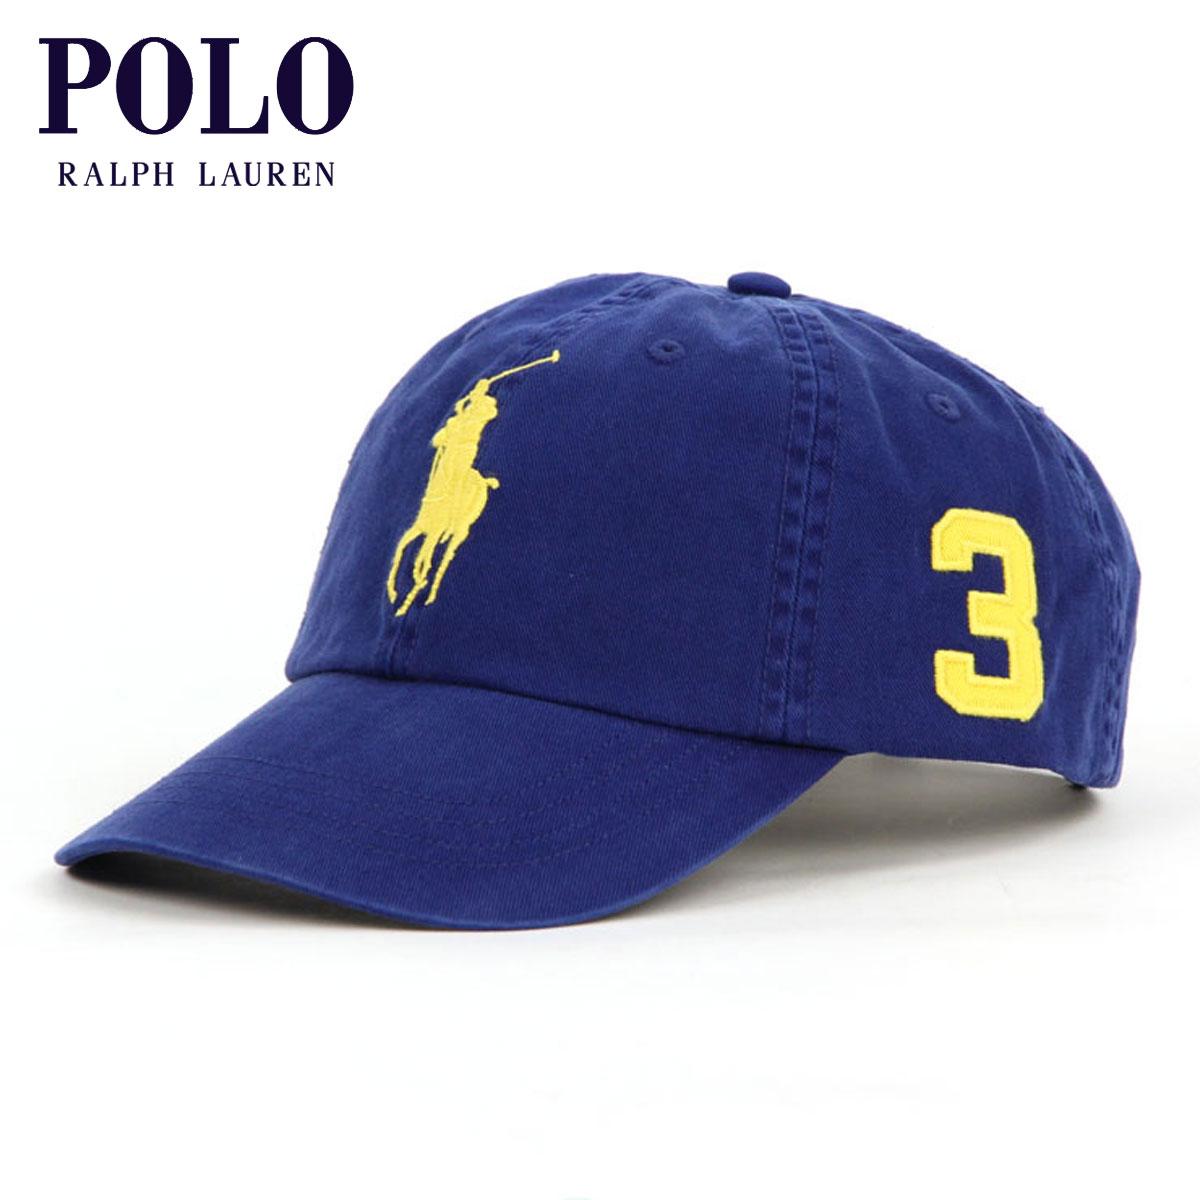 polo ralph lauren cotton chino baseball cap genuine men hat classic big pony script weekend bear